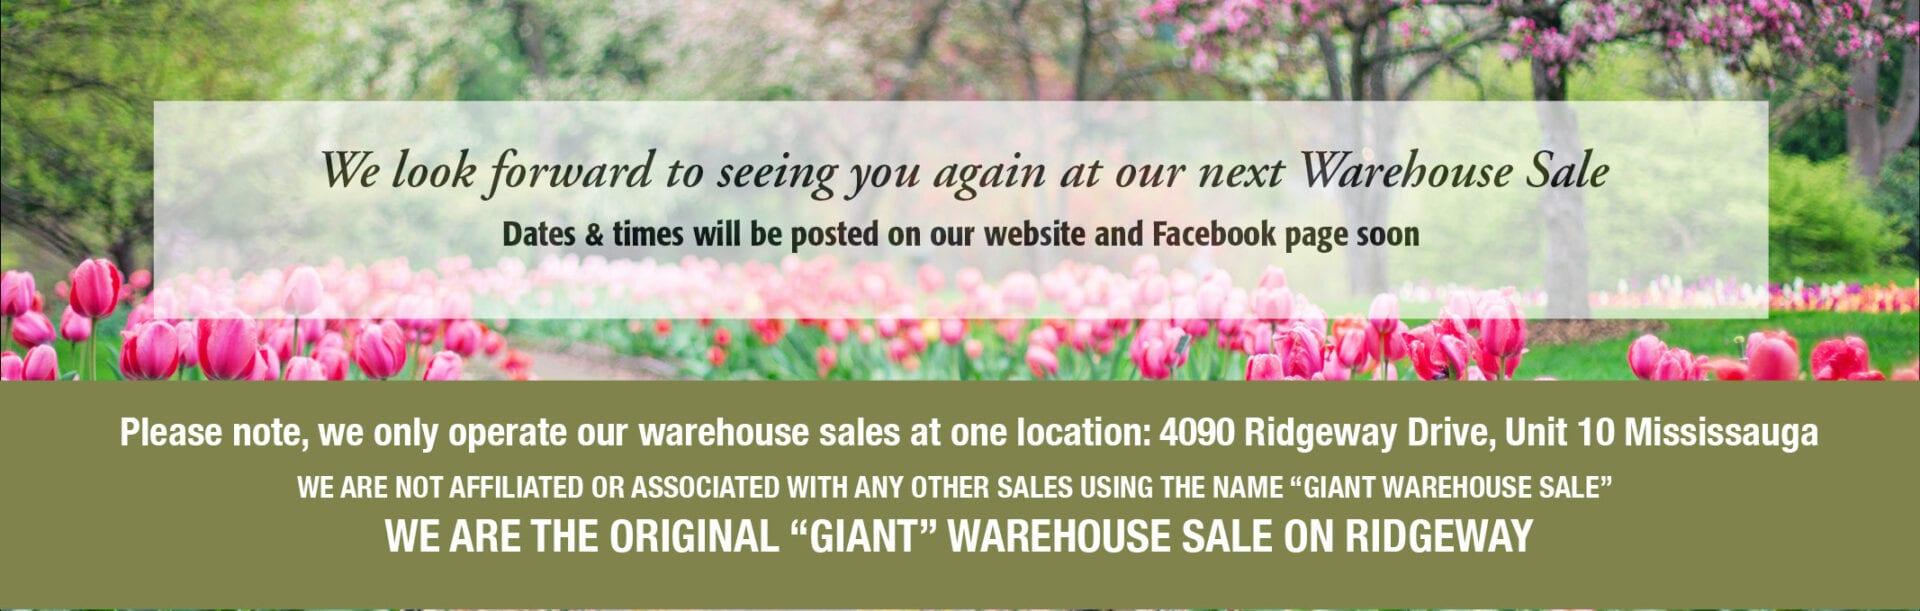 next warehouse sale